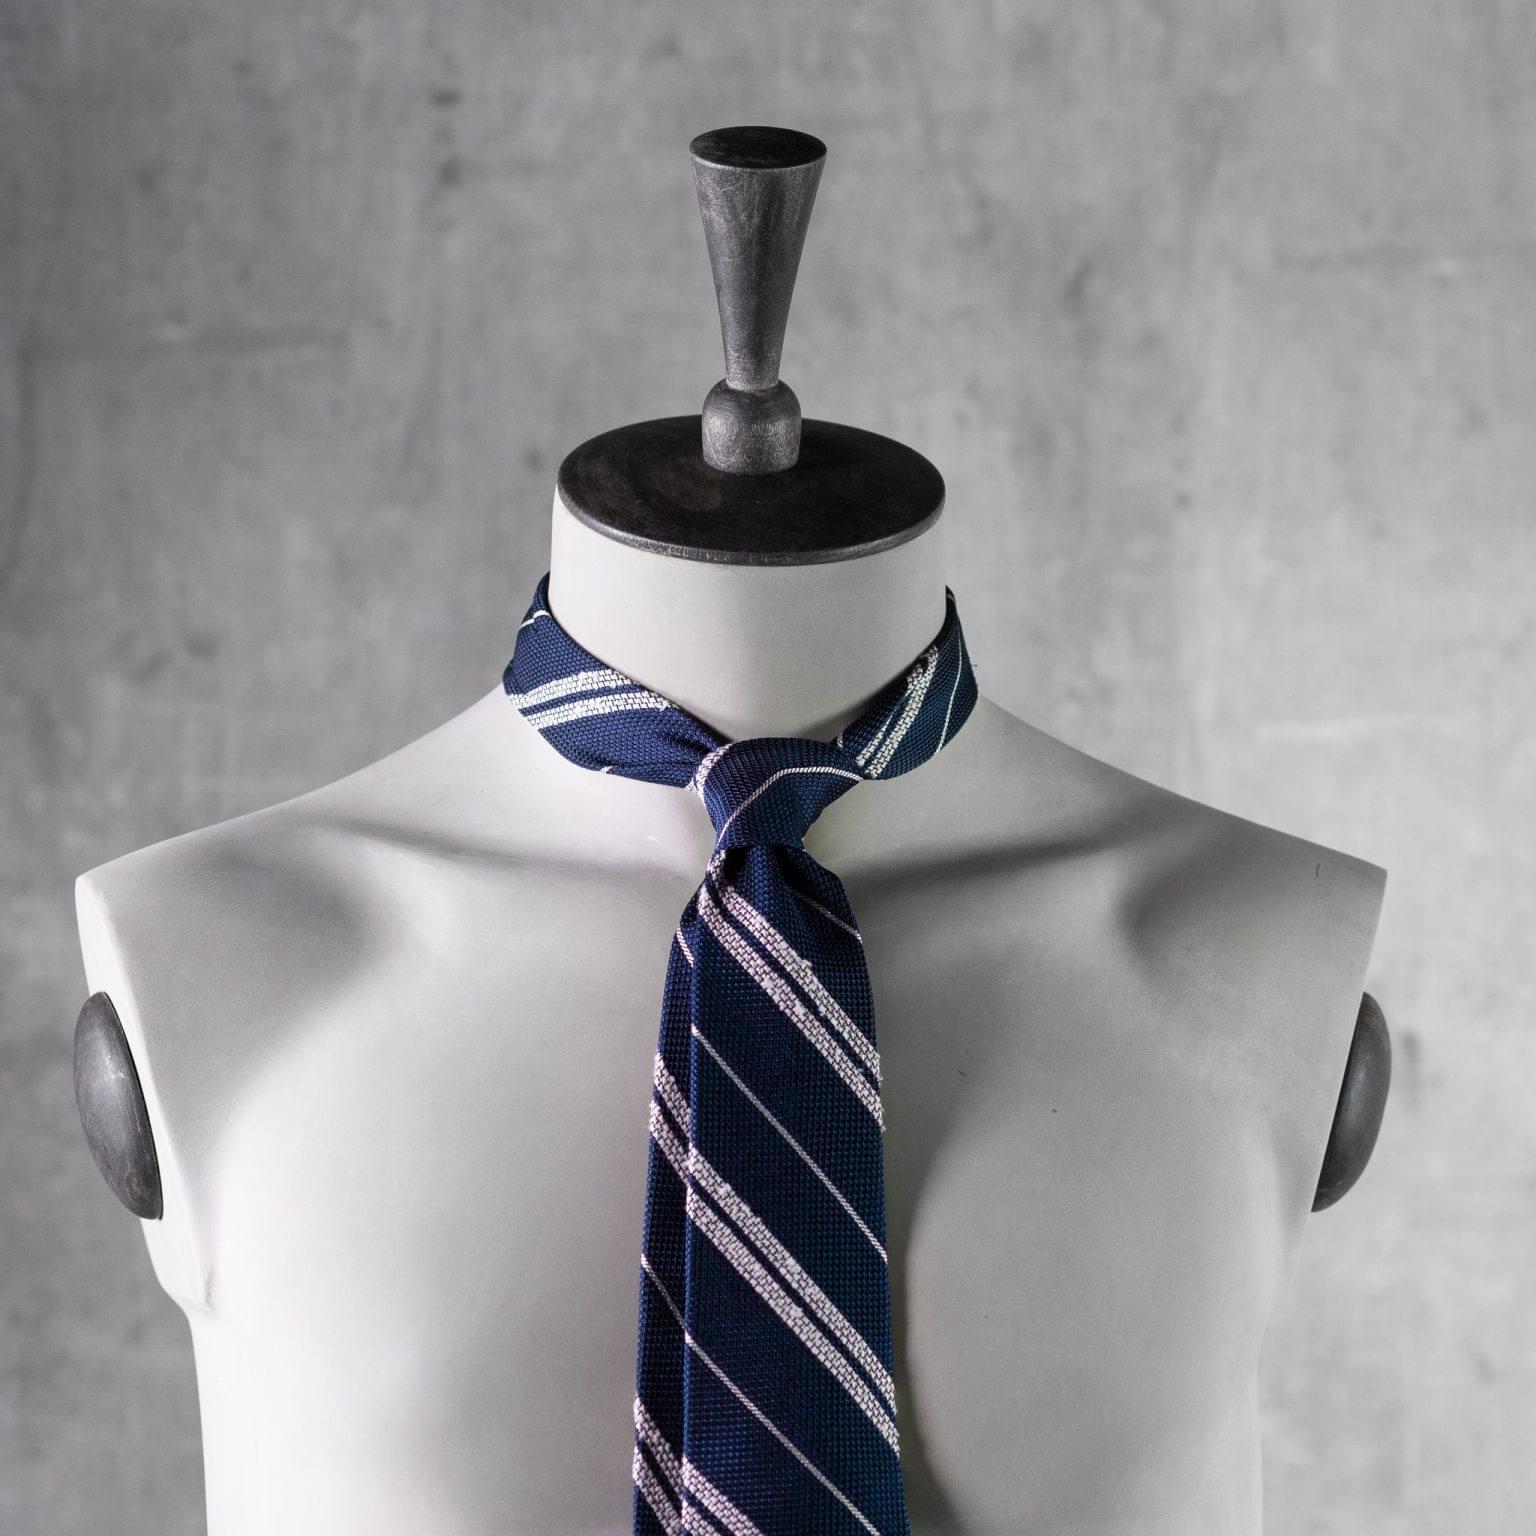 GRENADINE-0360-Tie-Initials-Corbata-Iniciales-The-Seelk-3